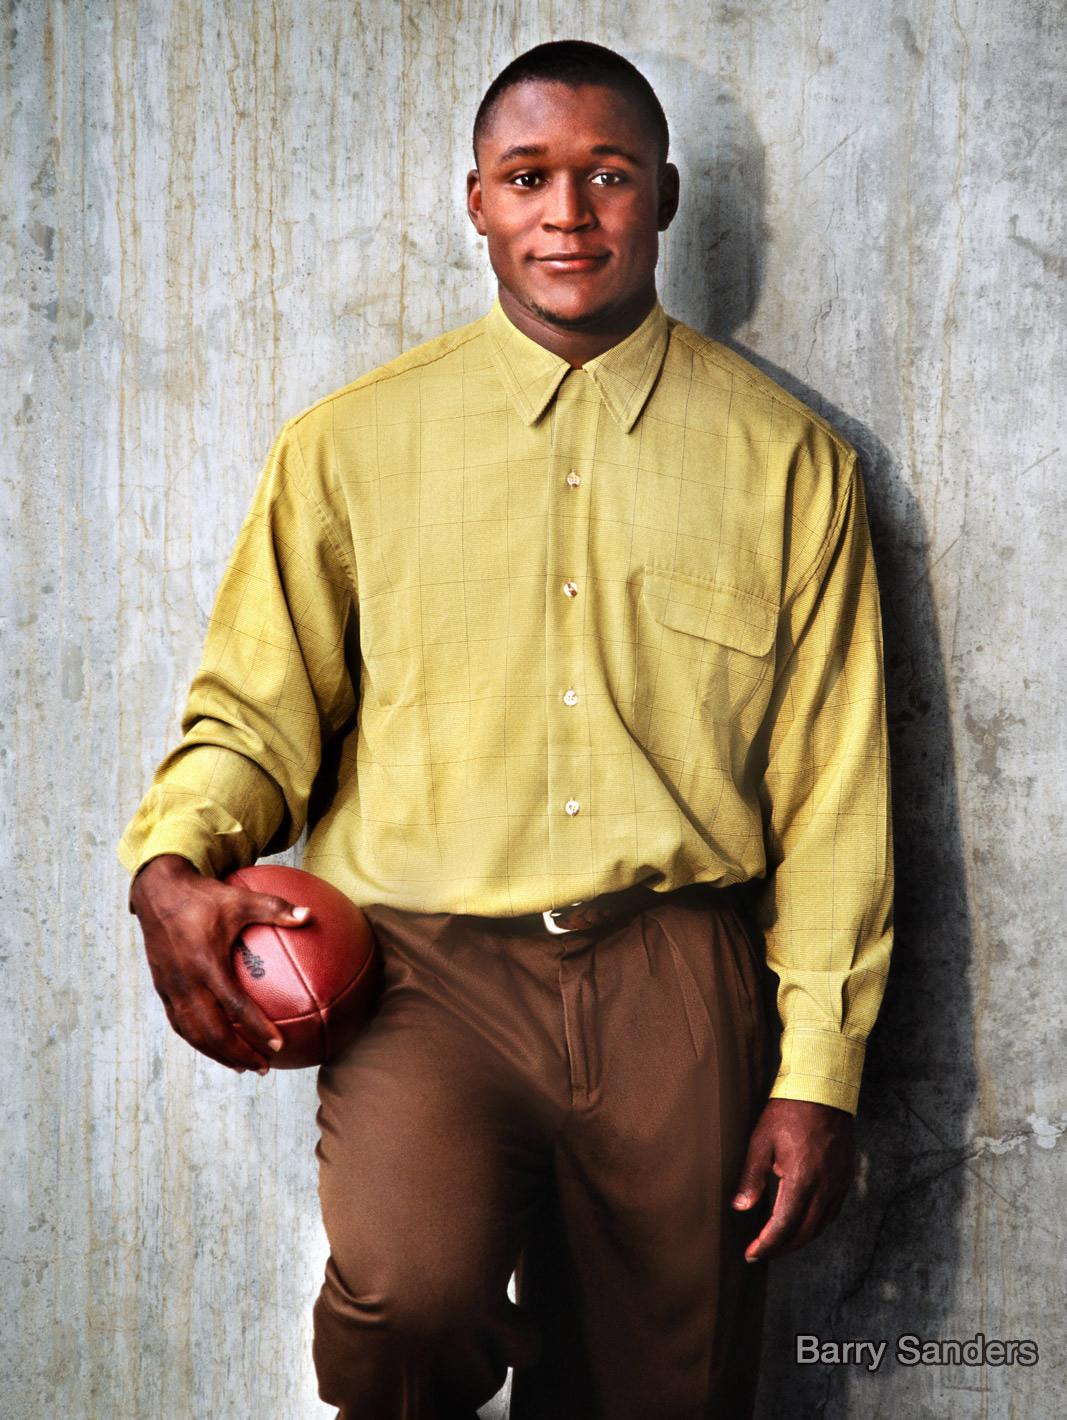 photo Barry Sanders NFL Hall of Fame